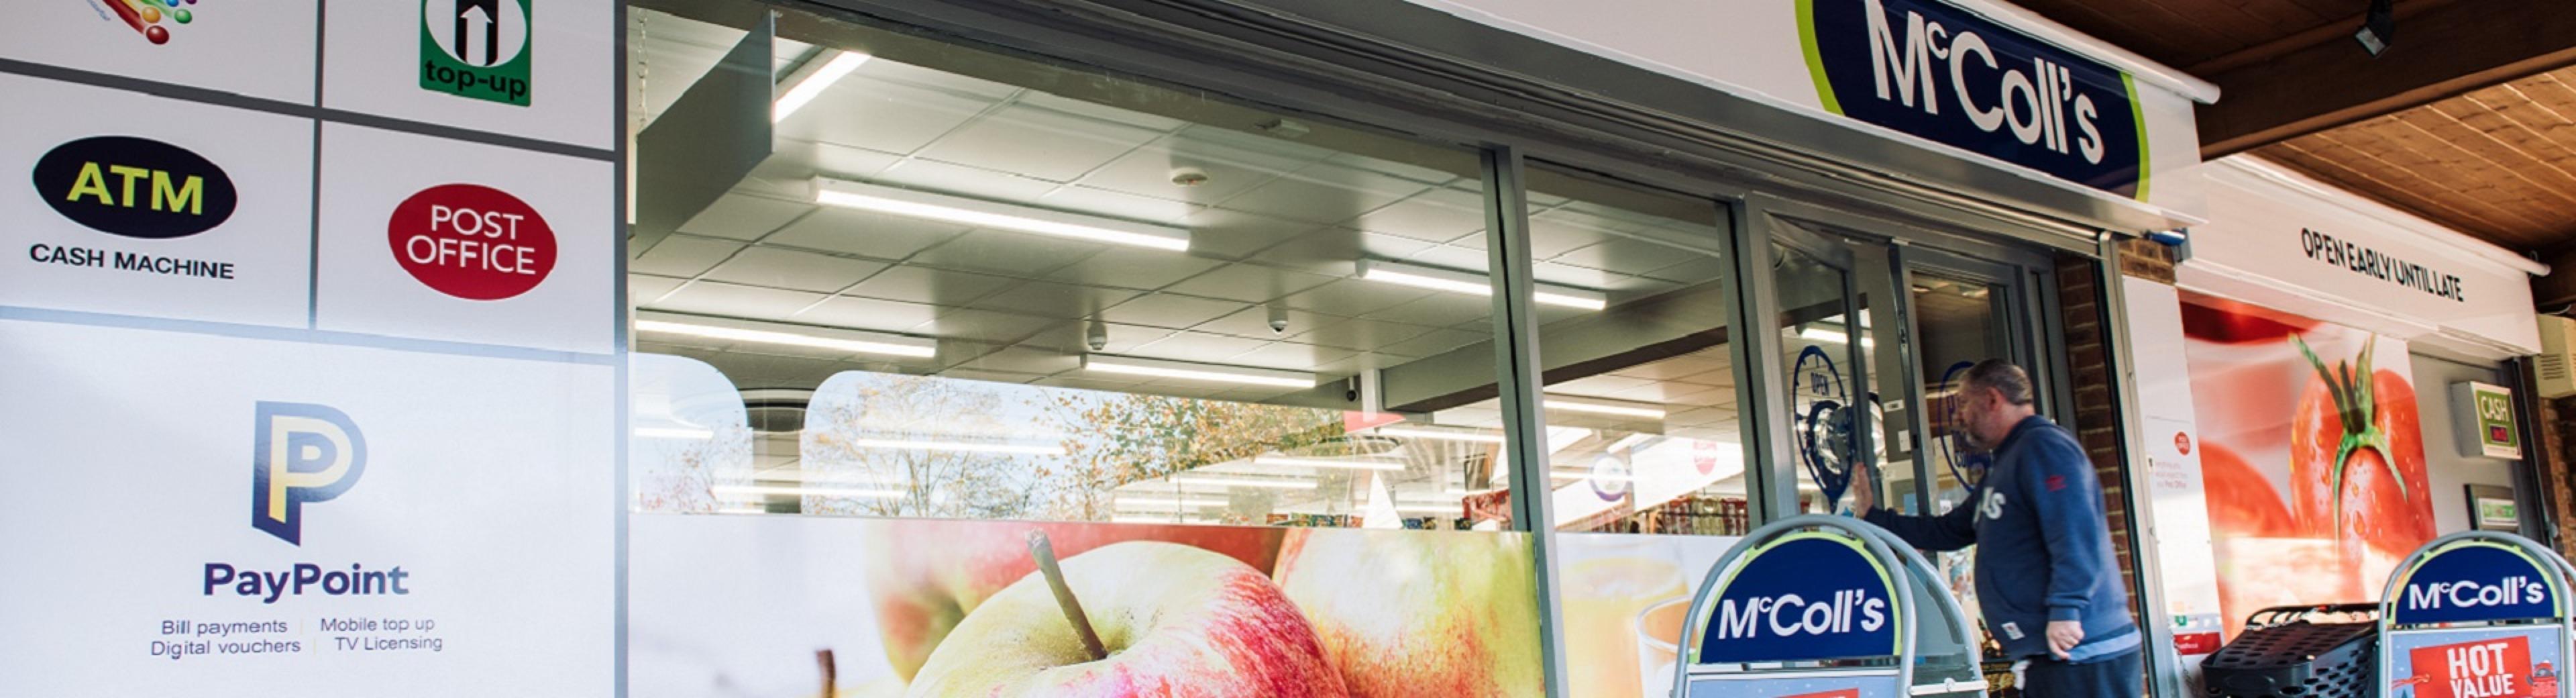 McColl's Is A Leading Neighbourhood Retailer